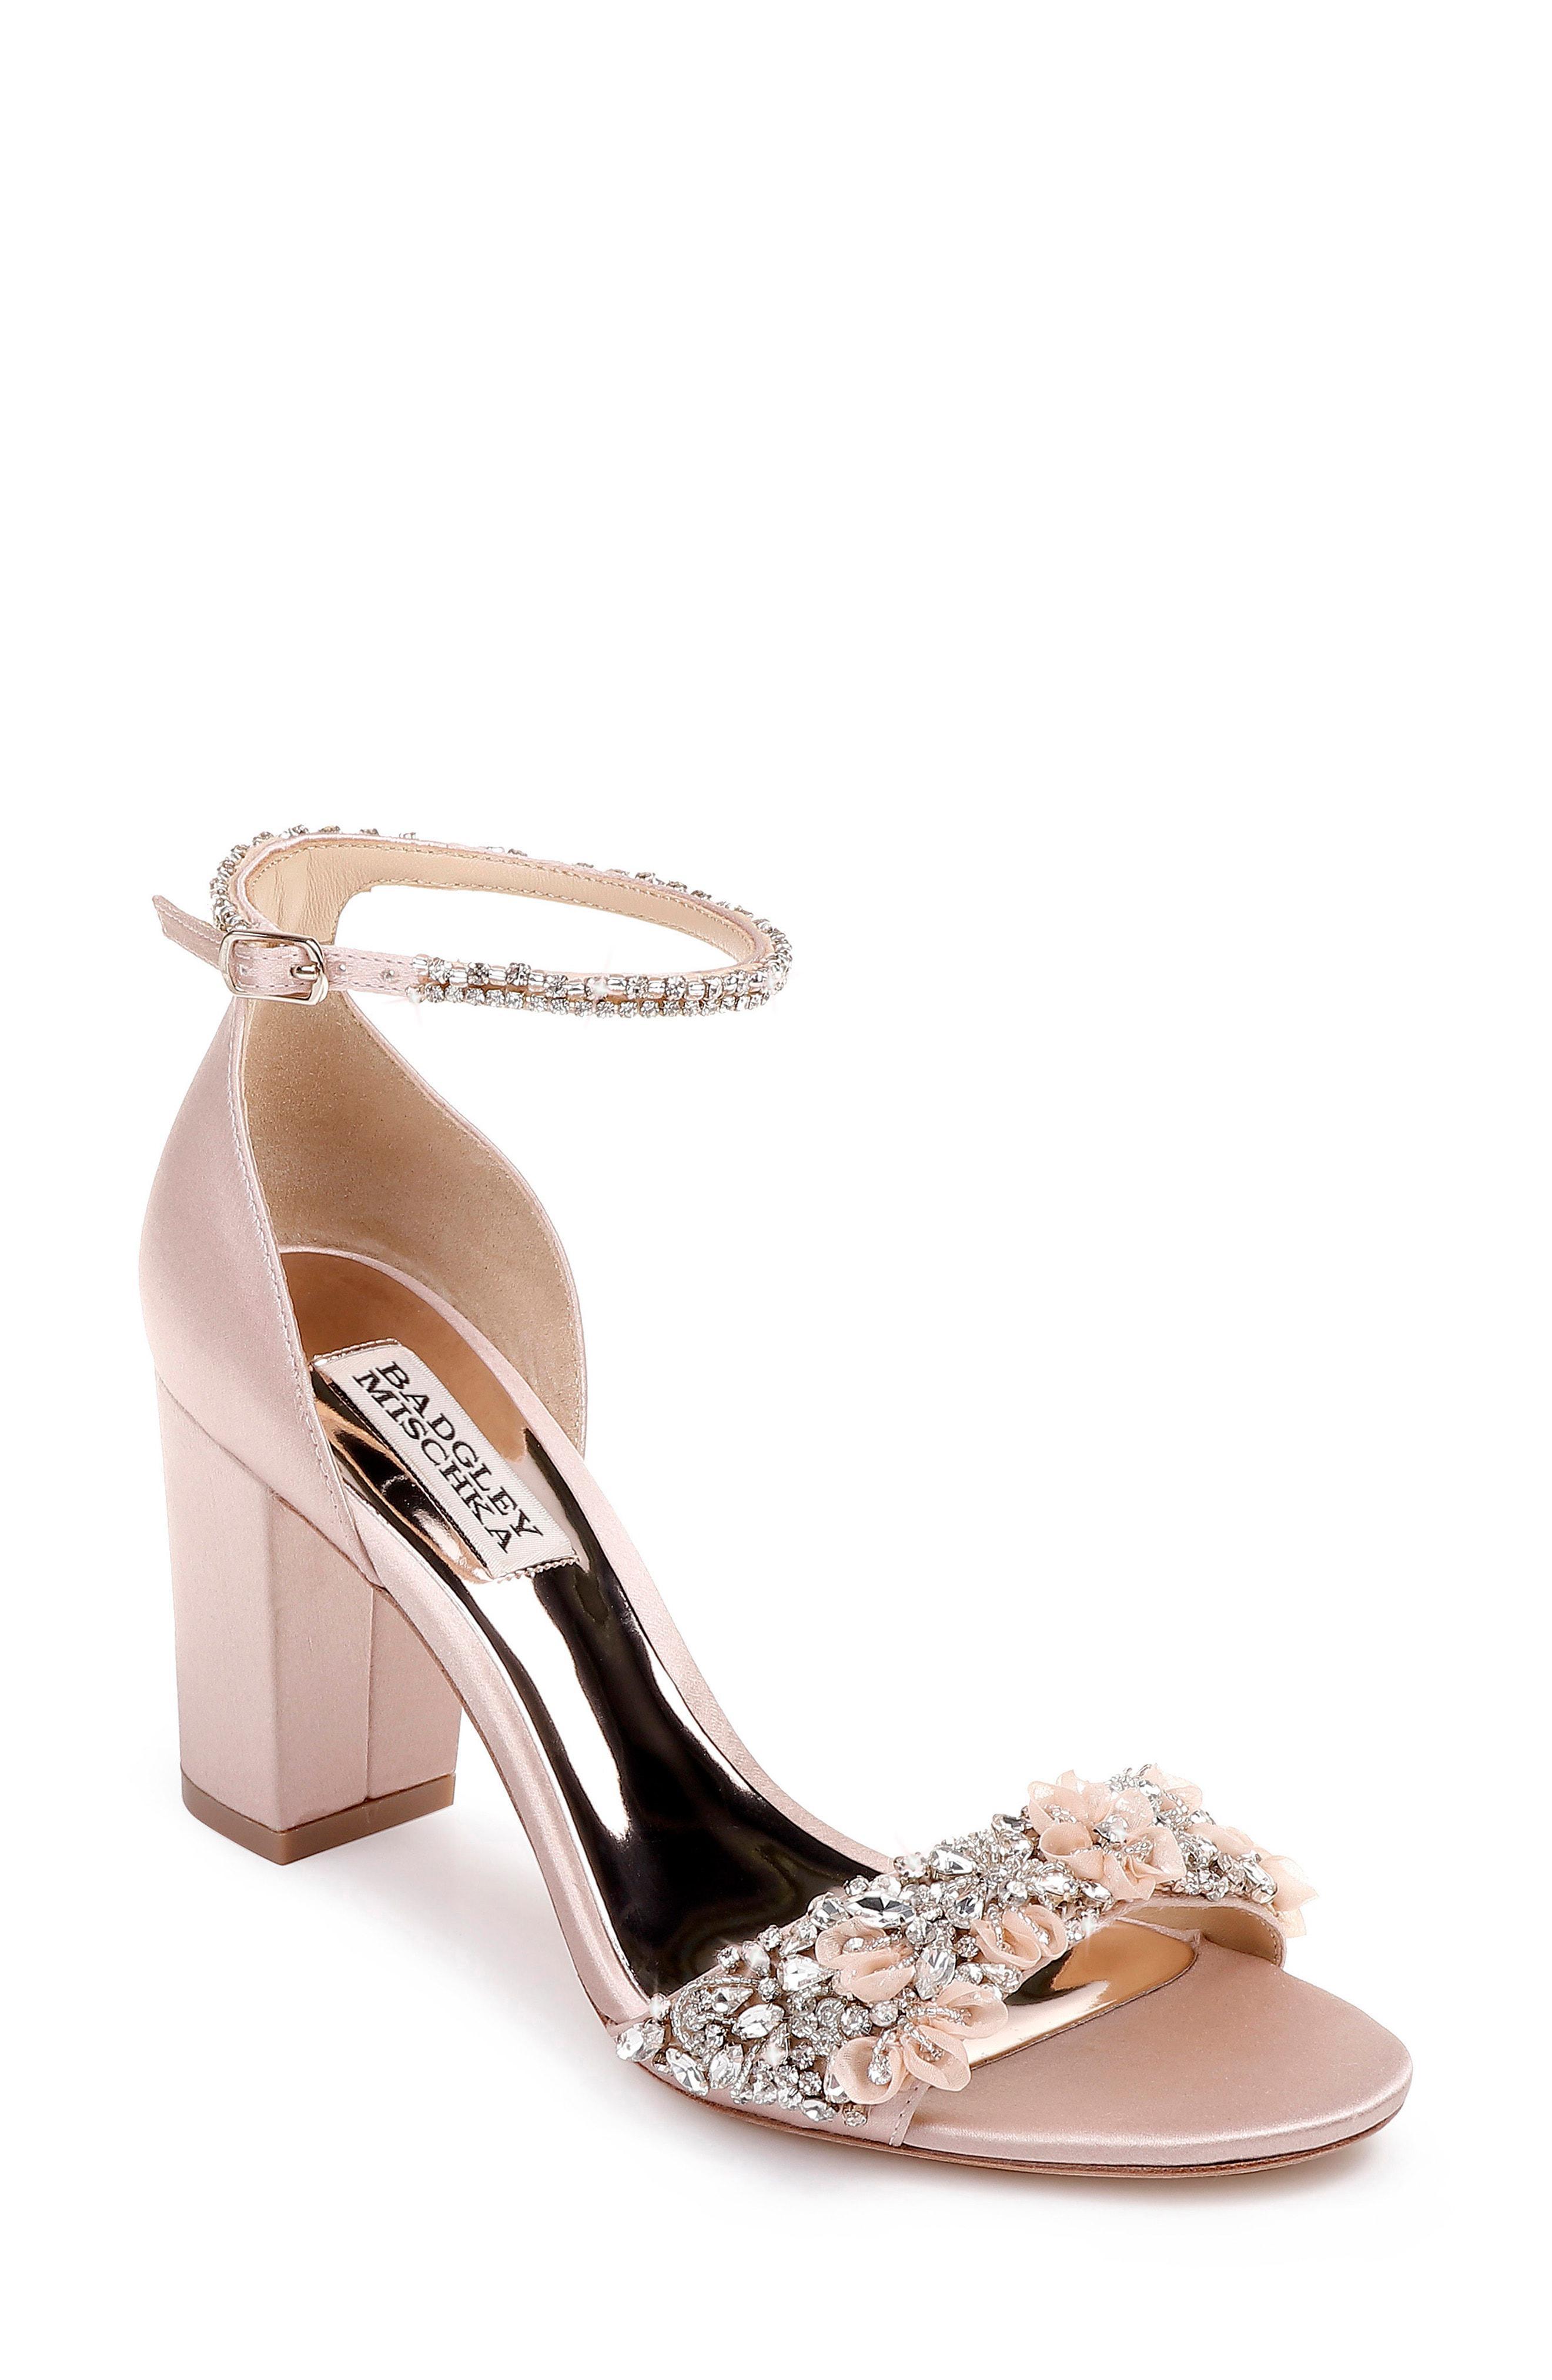 0d1c1b87cf8b Lyst - Badgley Mischka Badgley Mischka Finesse Ankle Strap Sandal